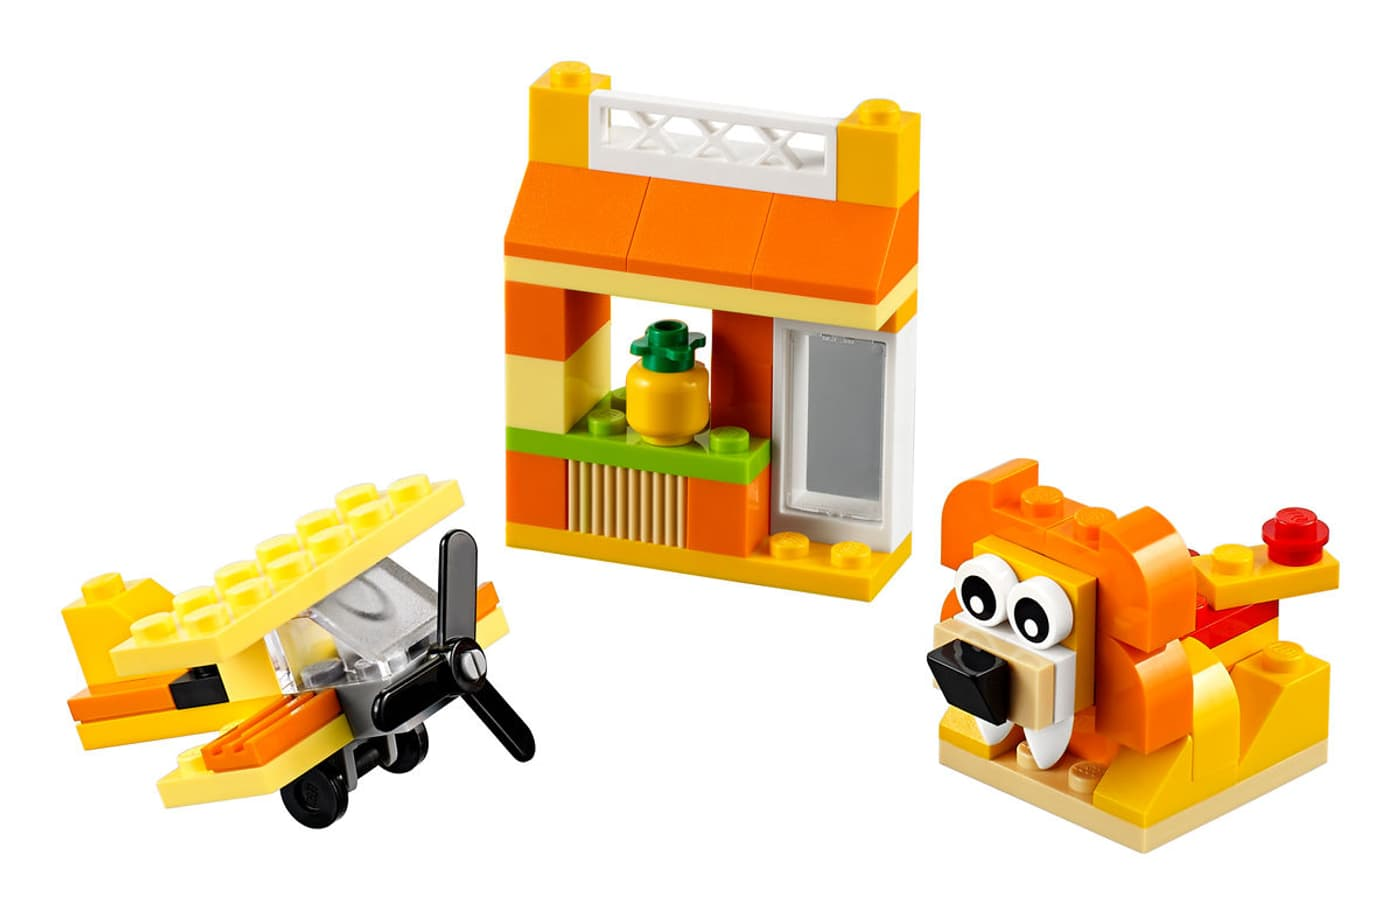 lego classic kreativ box orange 10709 migros. Black Bedroom Furniture Sets. Home Design Ideas